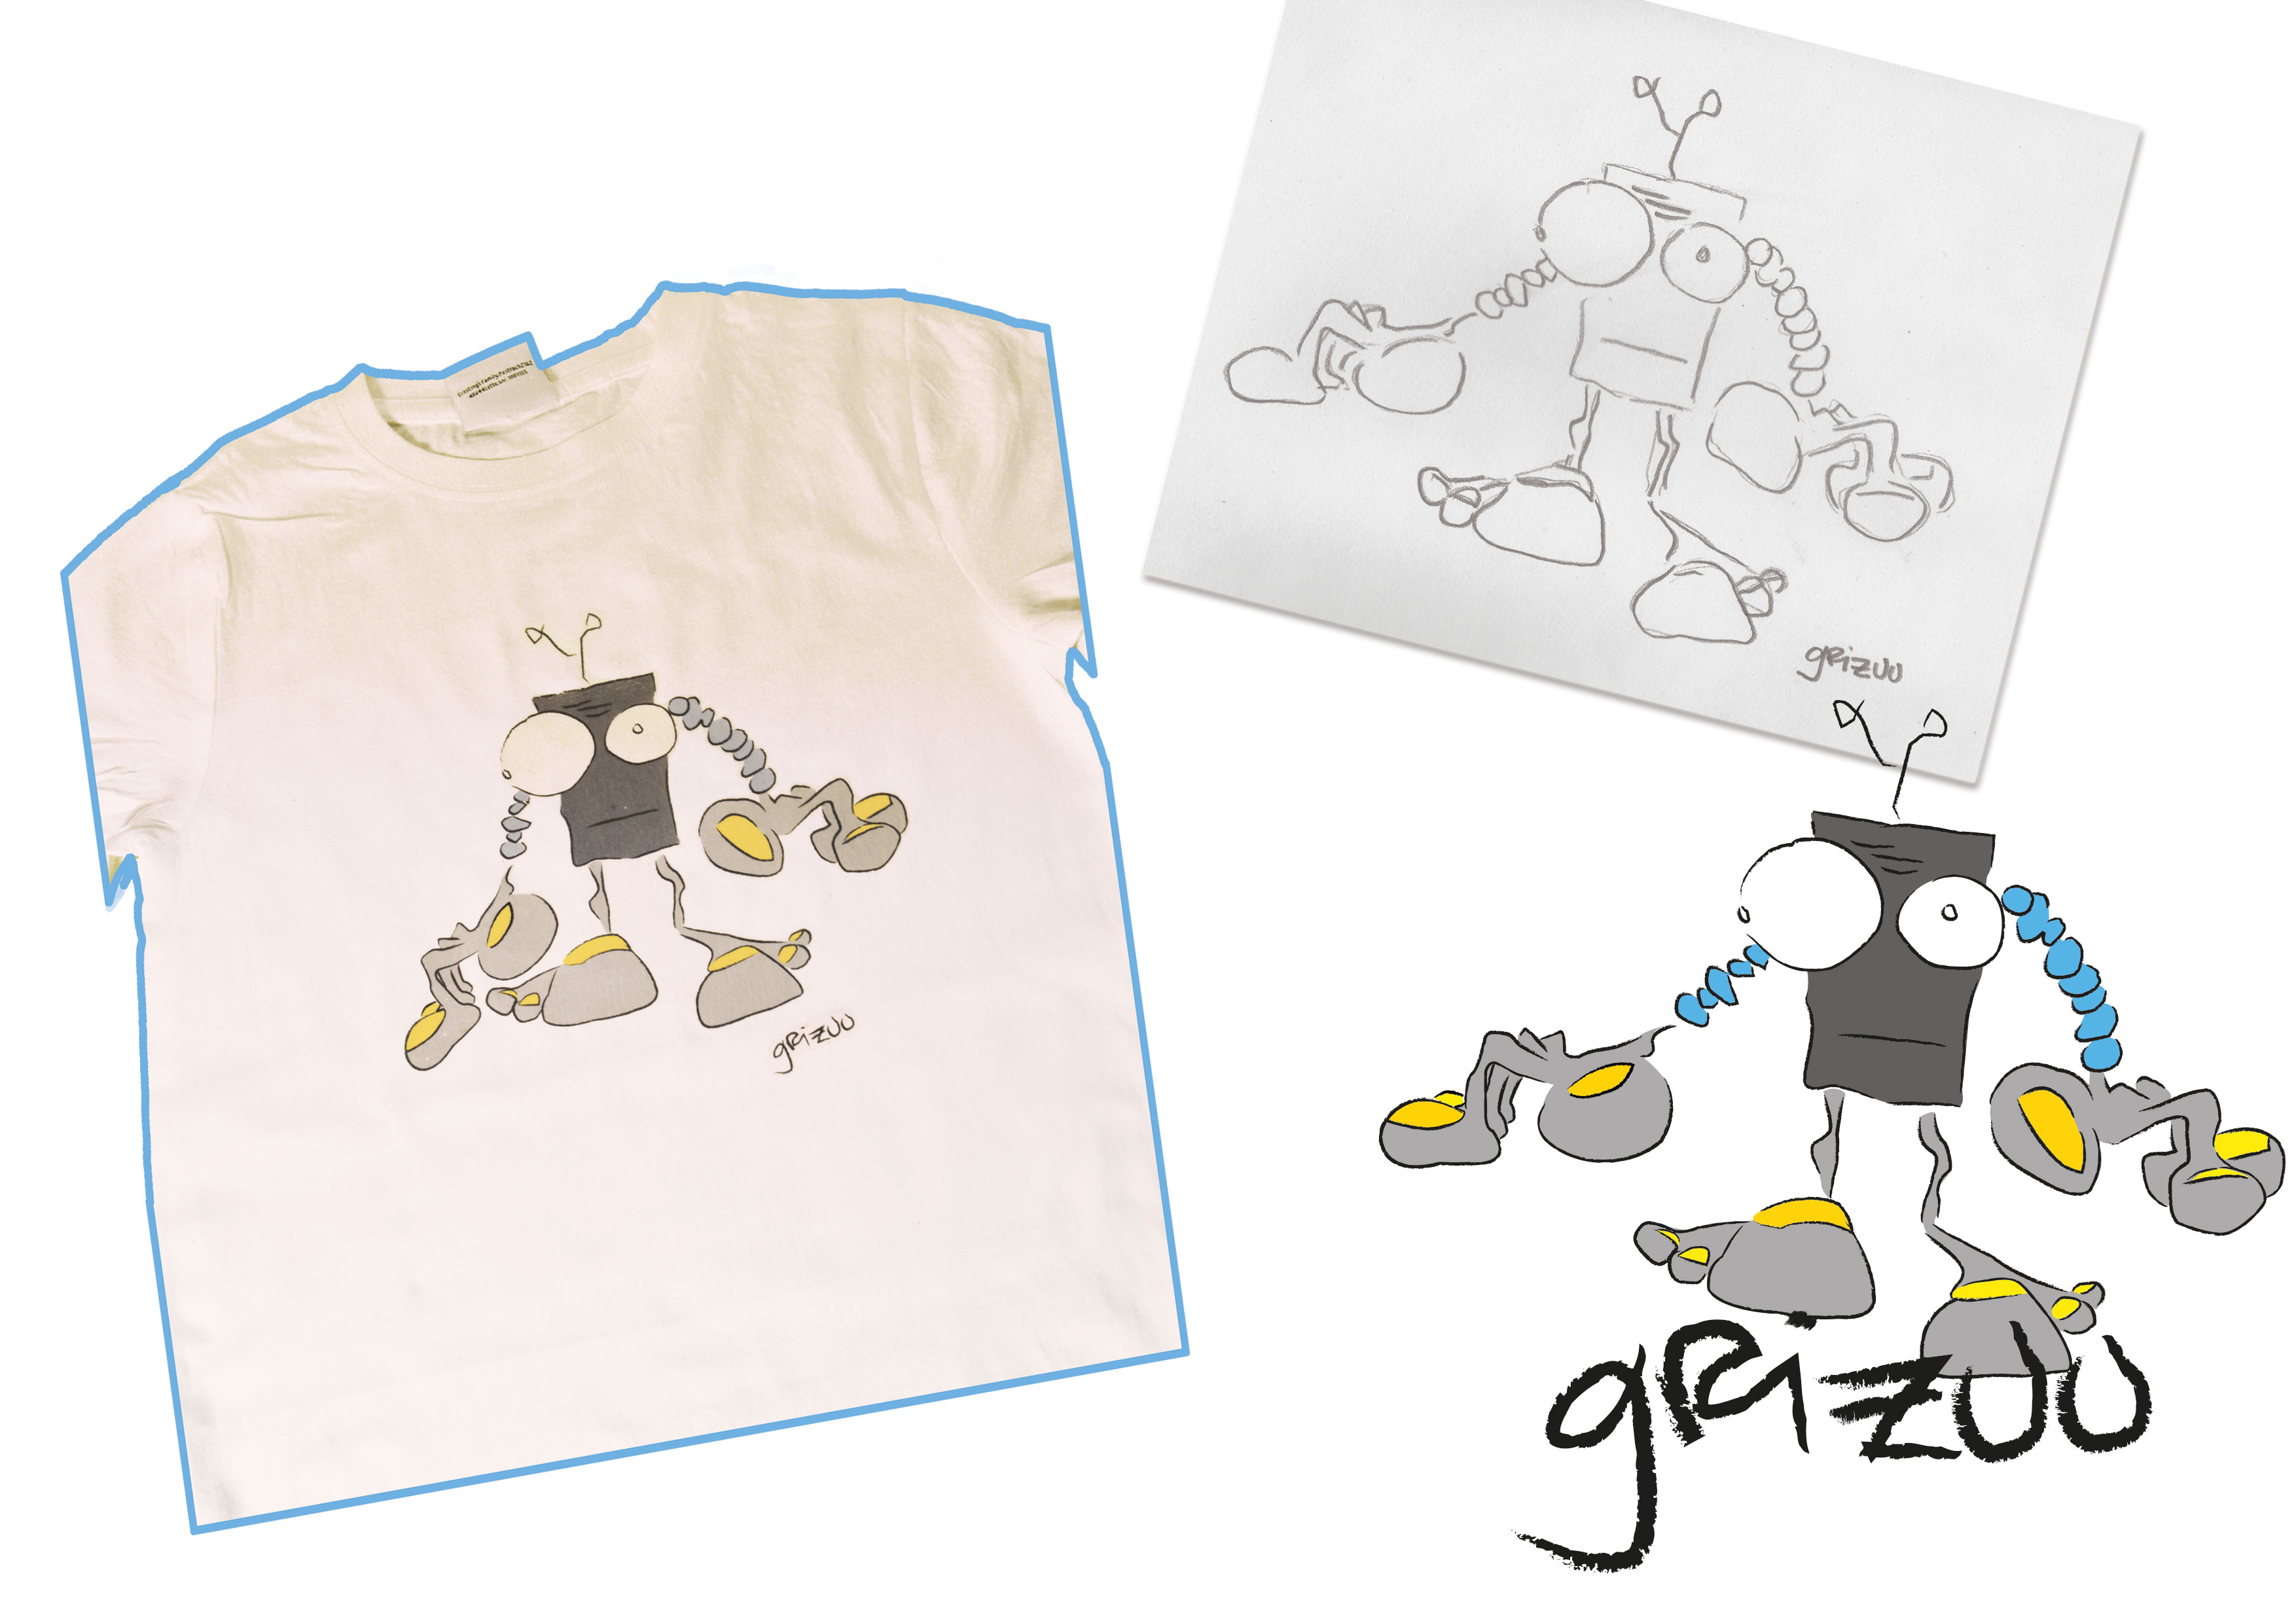 'Grizuu' Artwork made by chaoskind